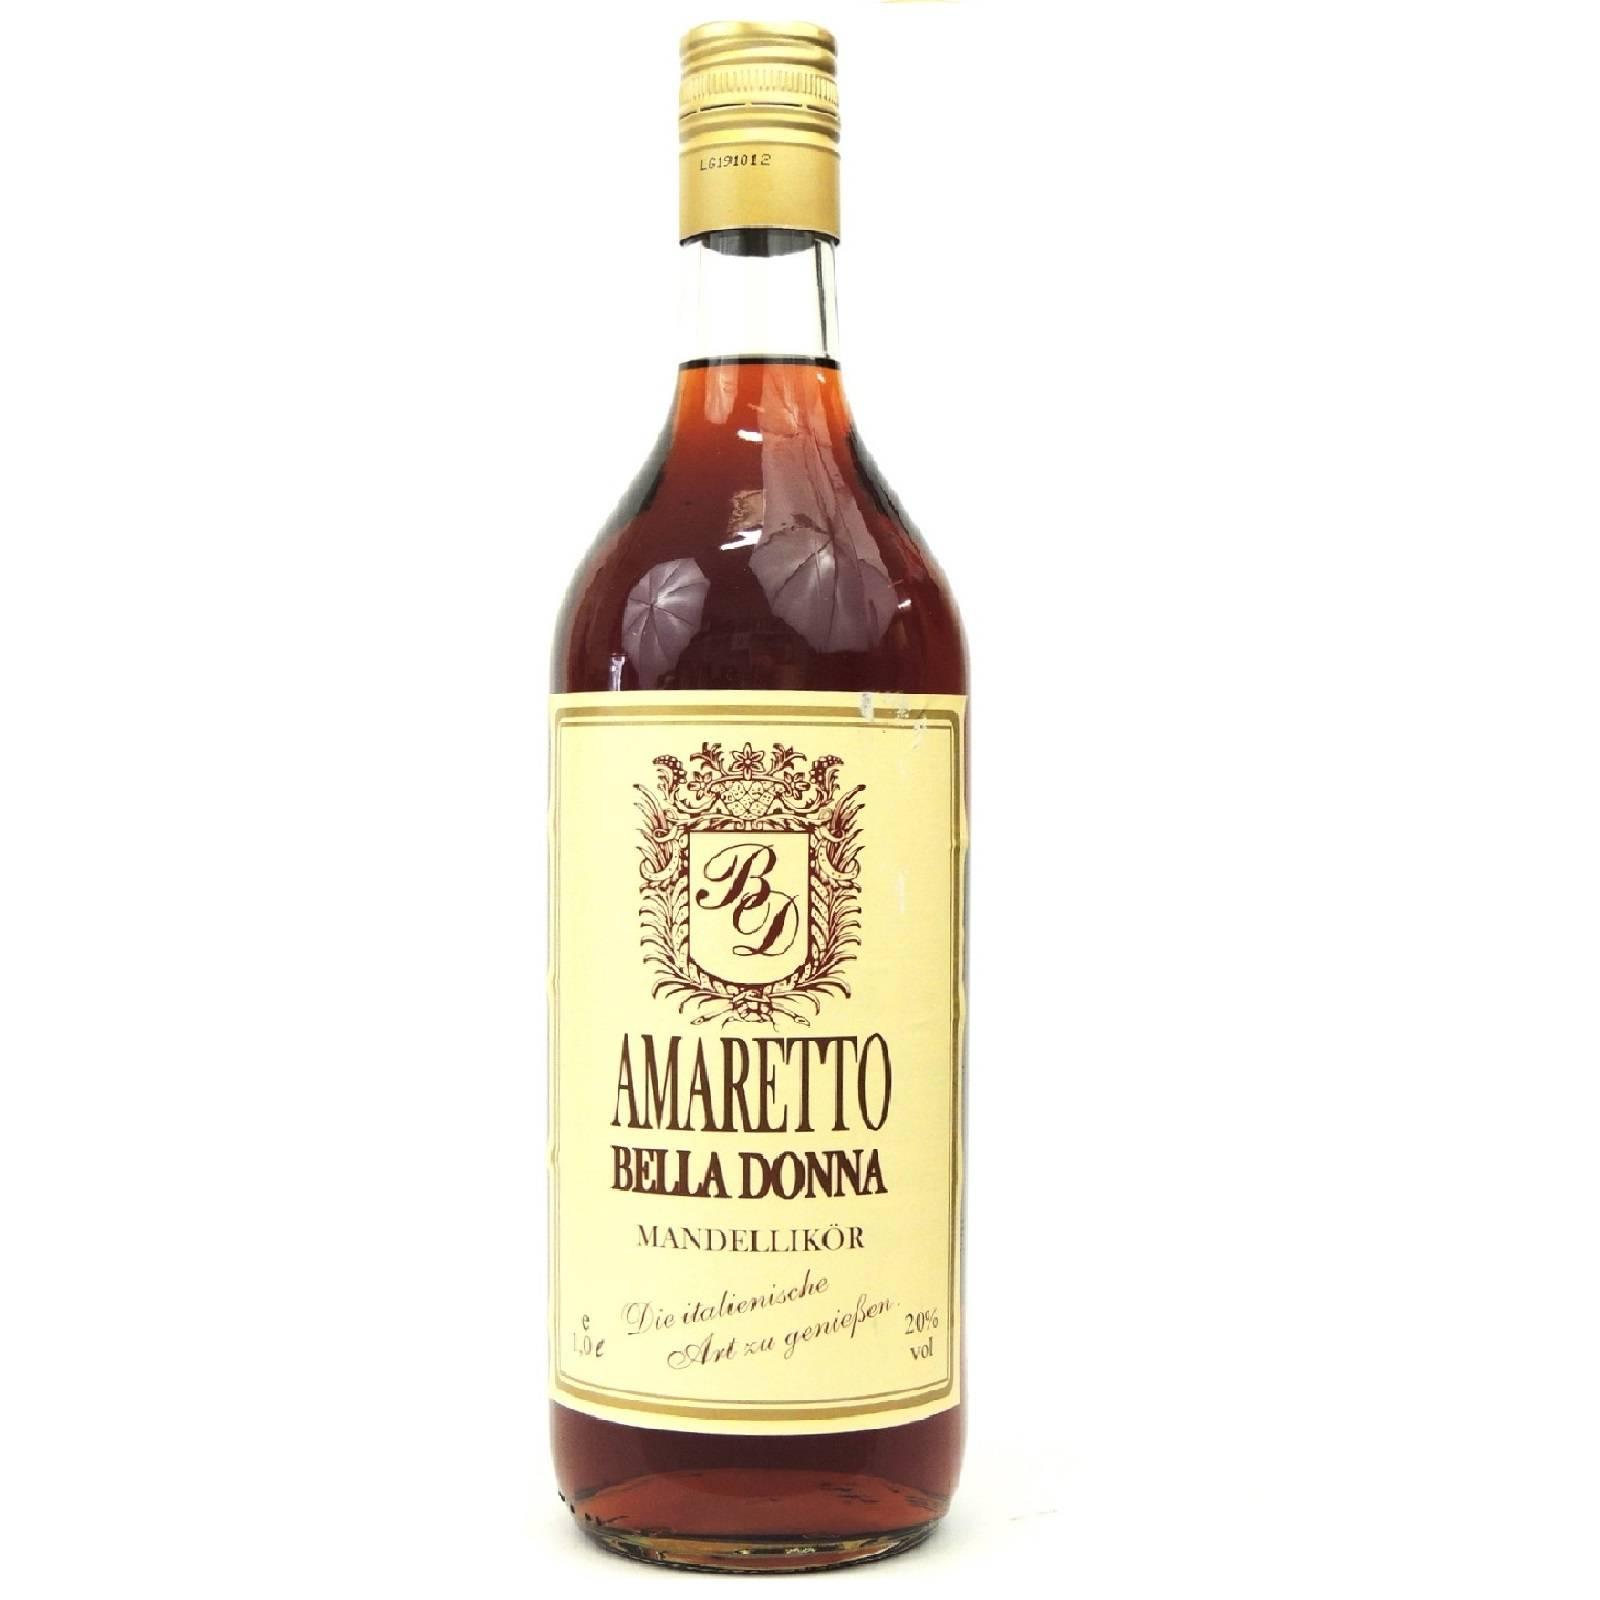 Amaretto Bella Donna Mandellikör 20% 1Ltr